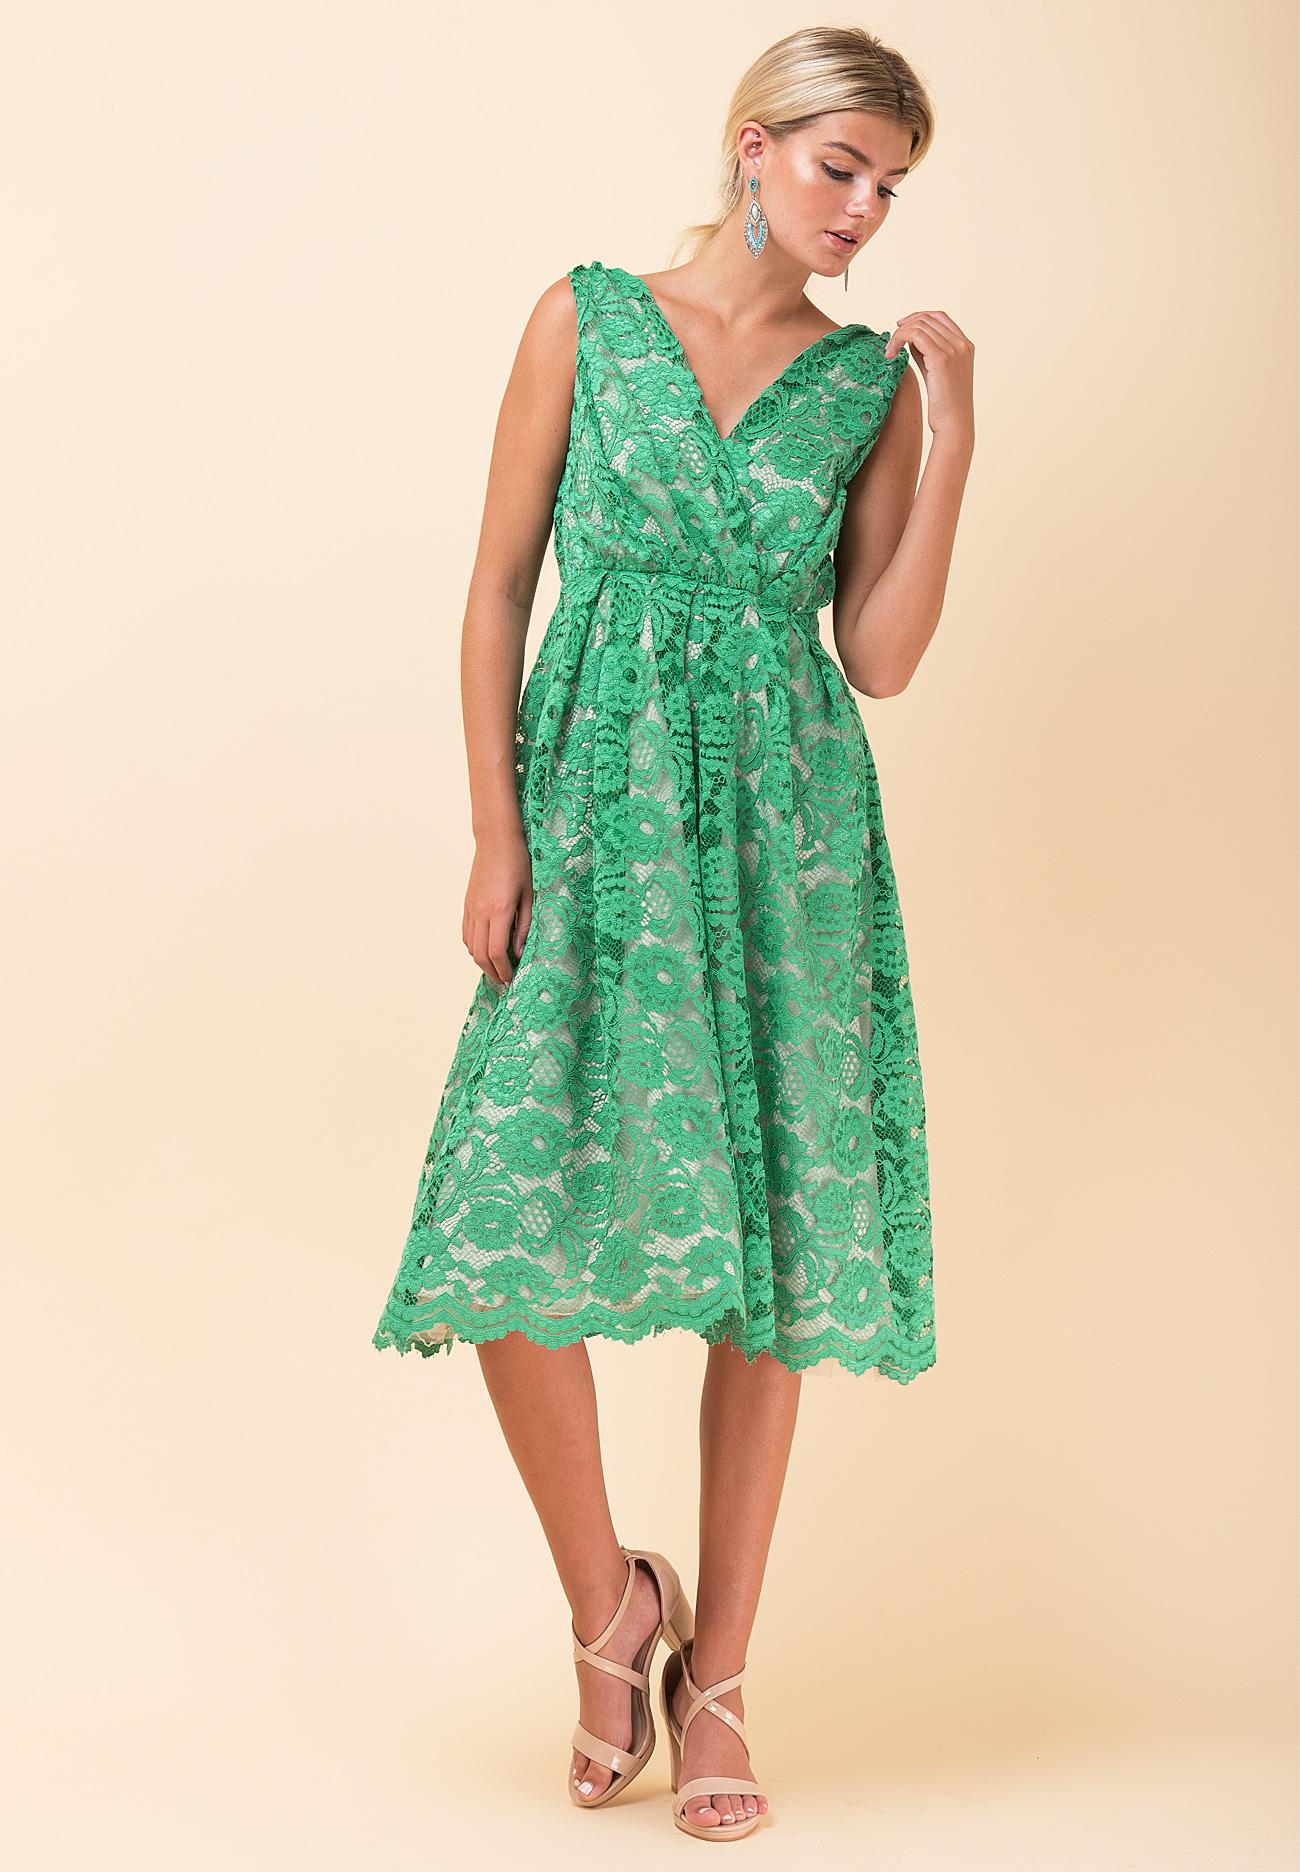 9ecb725bdeca Δαντελένιο κλος φόρεμα με φουρό - ZIC ZAC